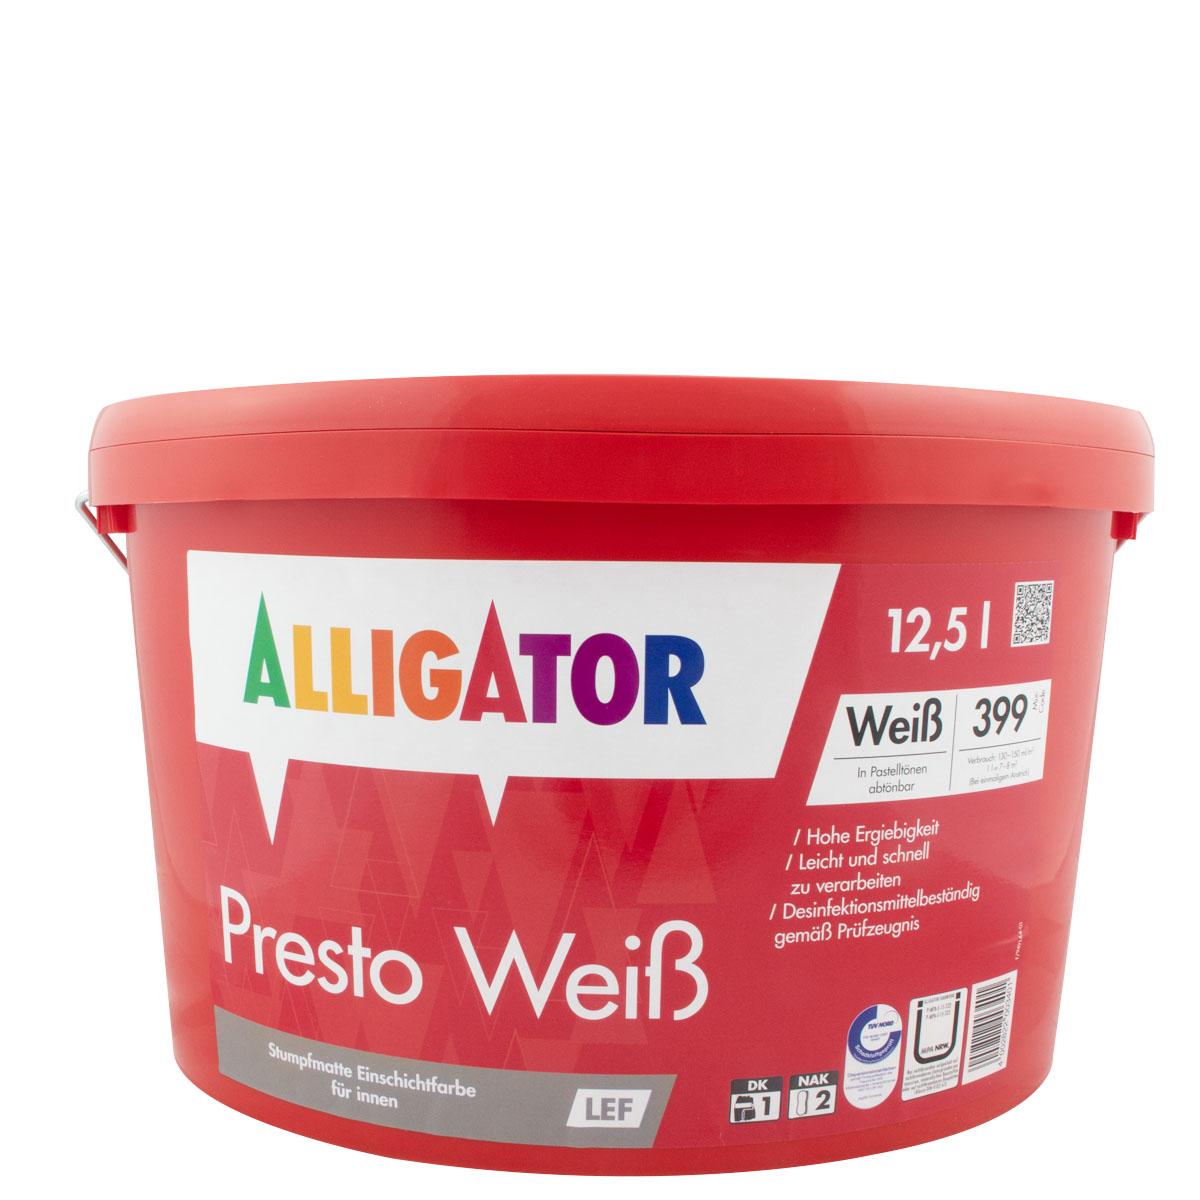 Alligator Presto Weiß LEF 12,5L MIX PG A ,Dispersions-Innenfarbe